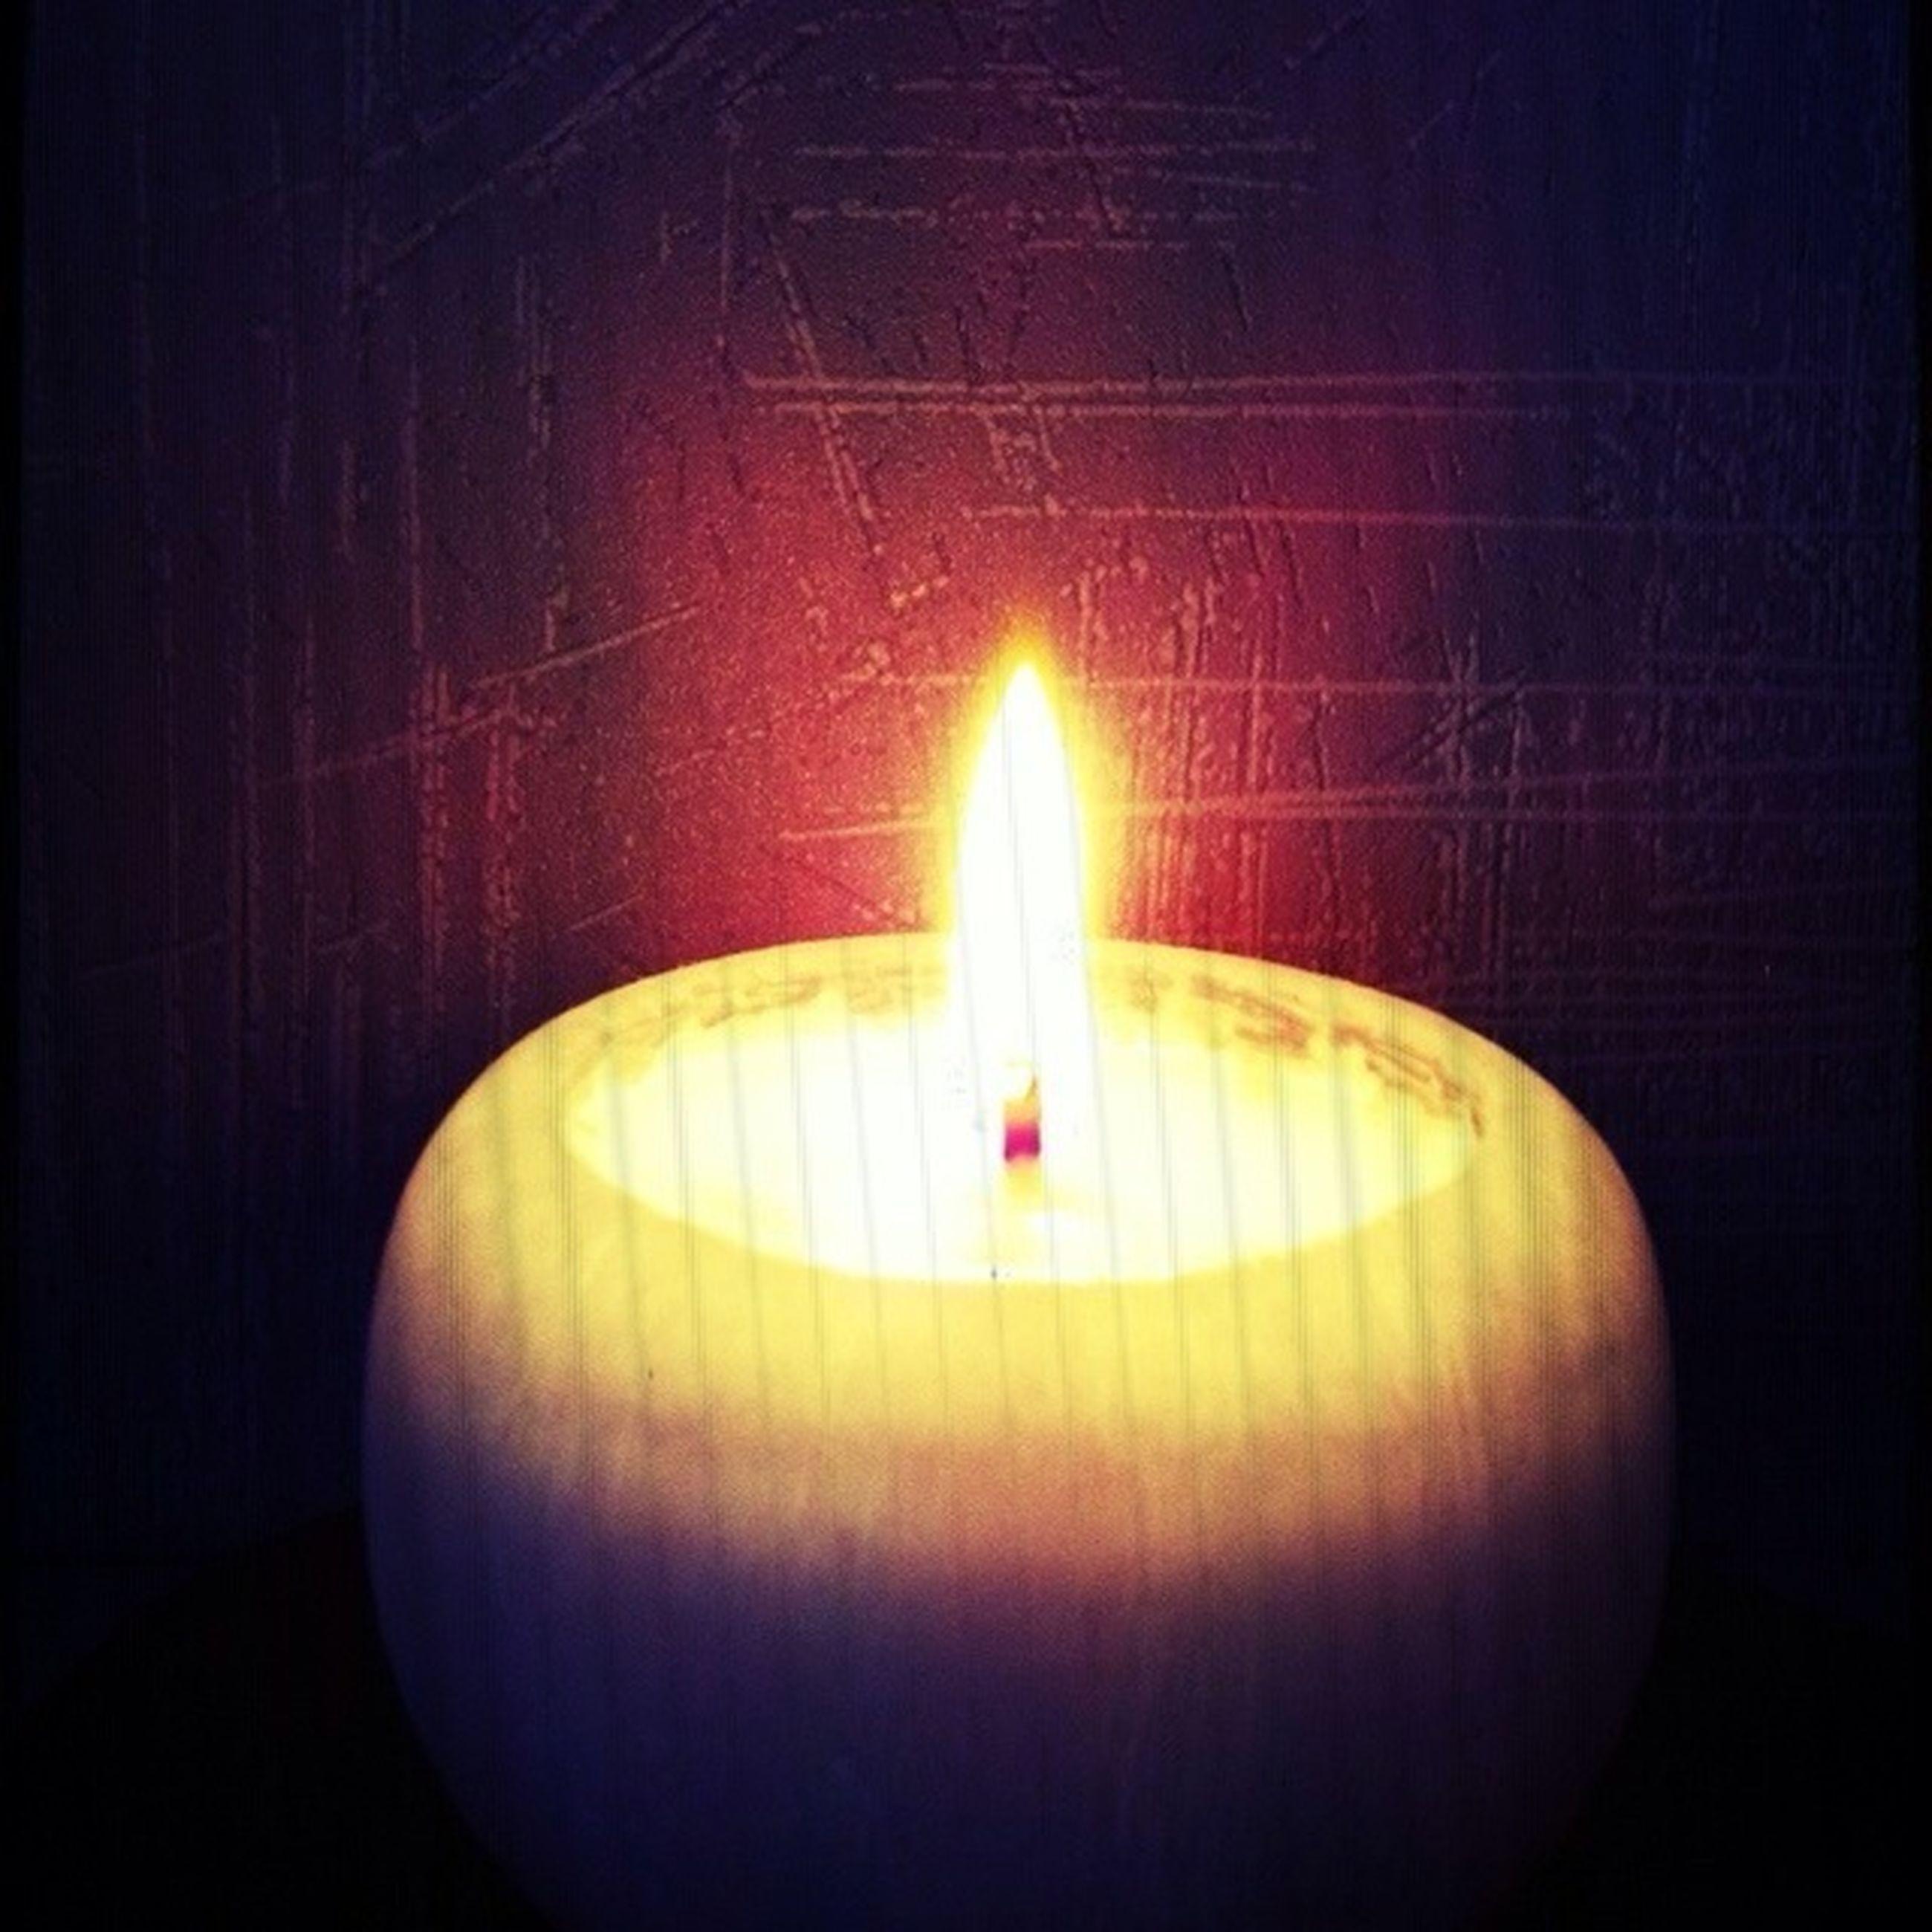 illuminated, flame, burning, glowing, indoors, candle, fire - natural phenomenon, heat - temperature, lit, lighting equipment, night, electricity, dark, darkroom, close-up, light - natural phenomenon, candlelight, fire, light bulb, light